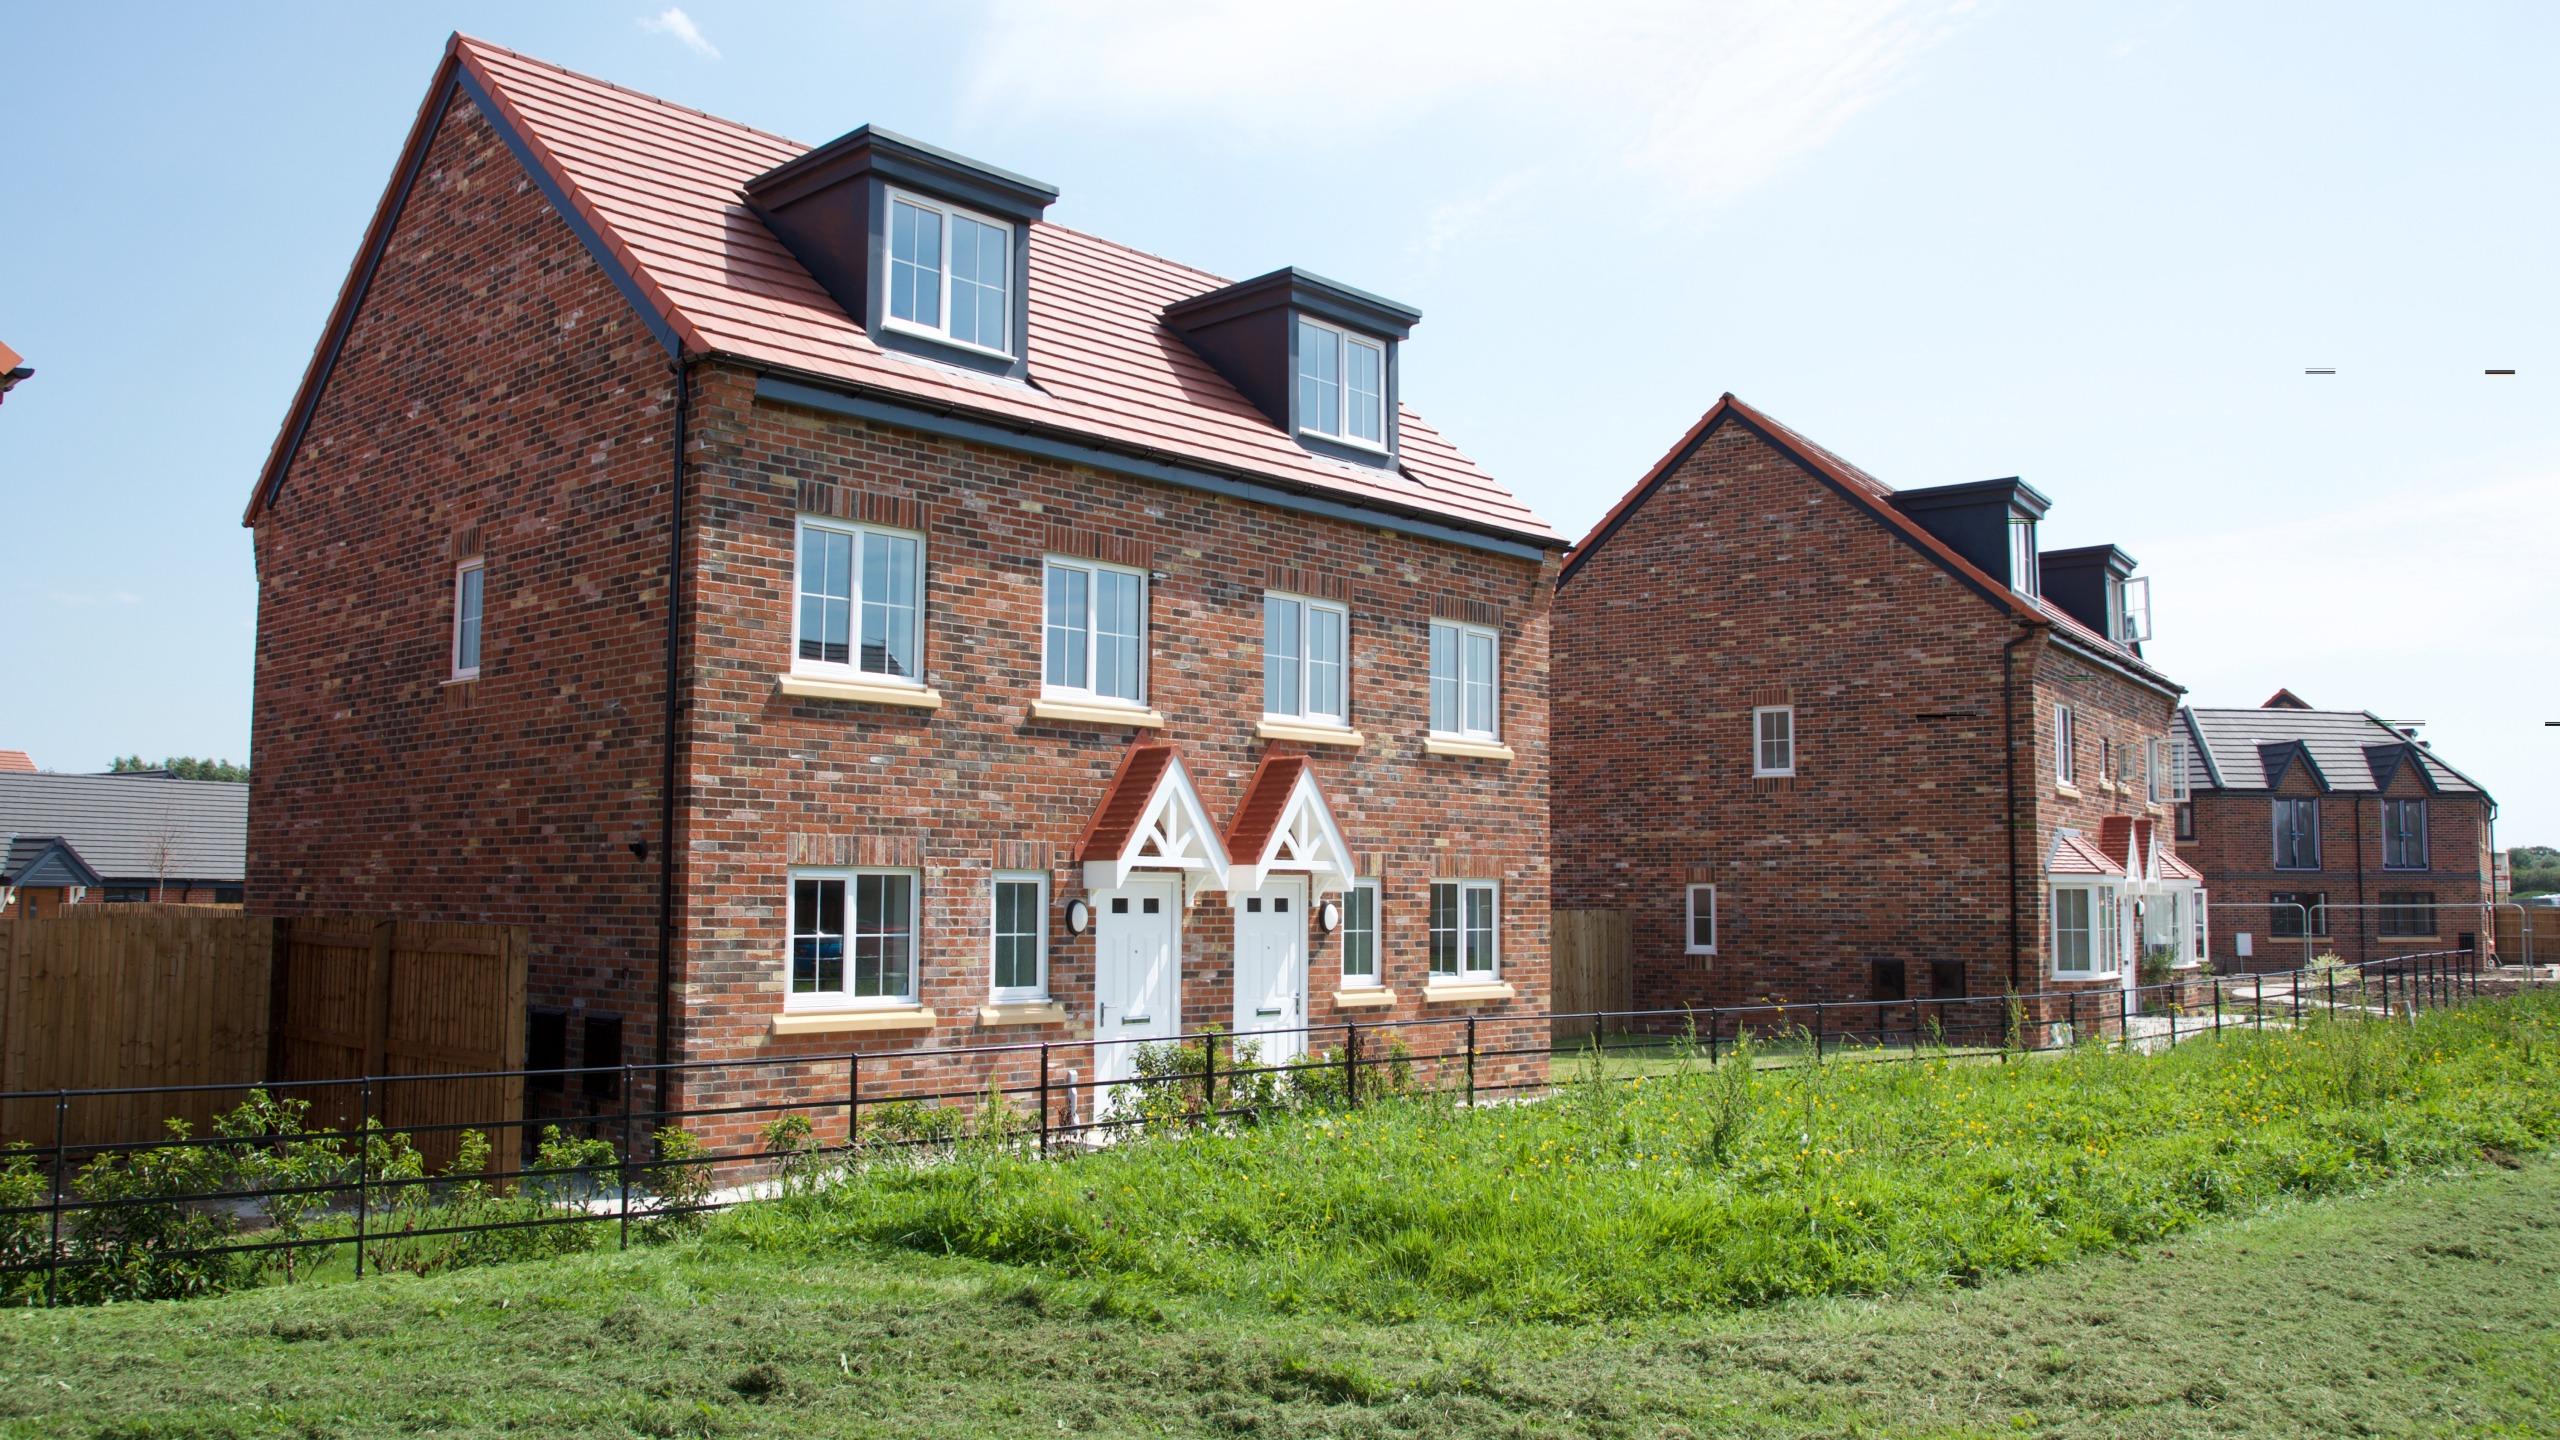 Woodford Grange, Winsford